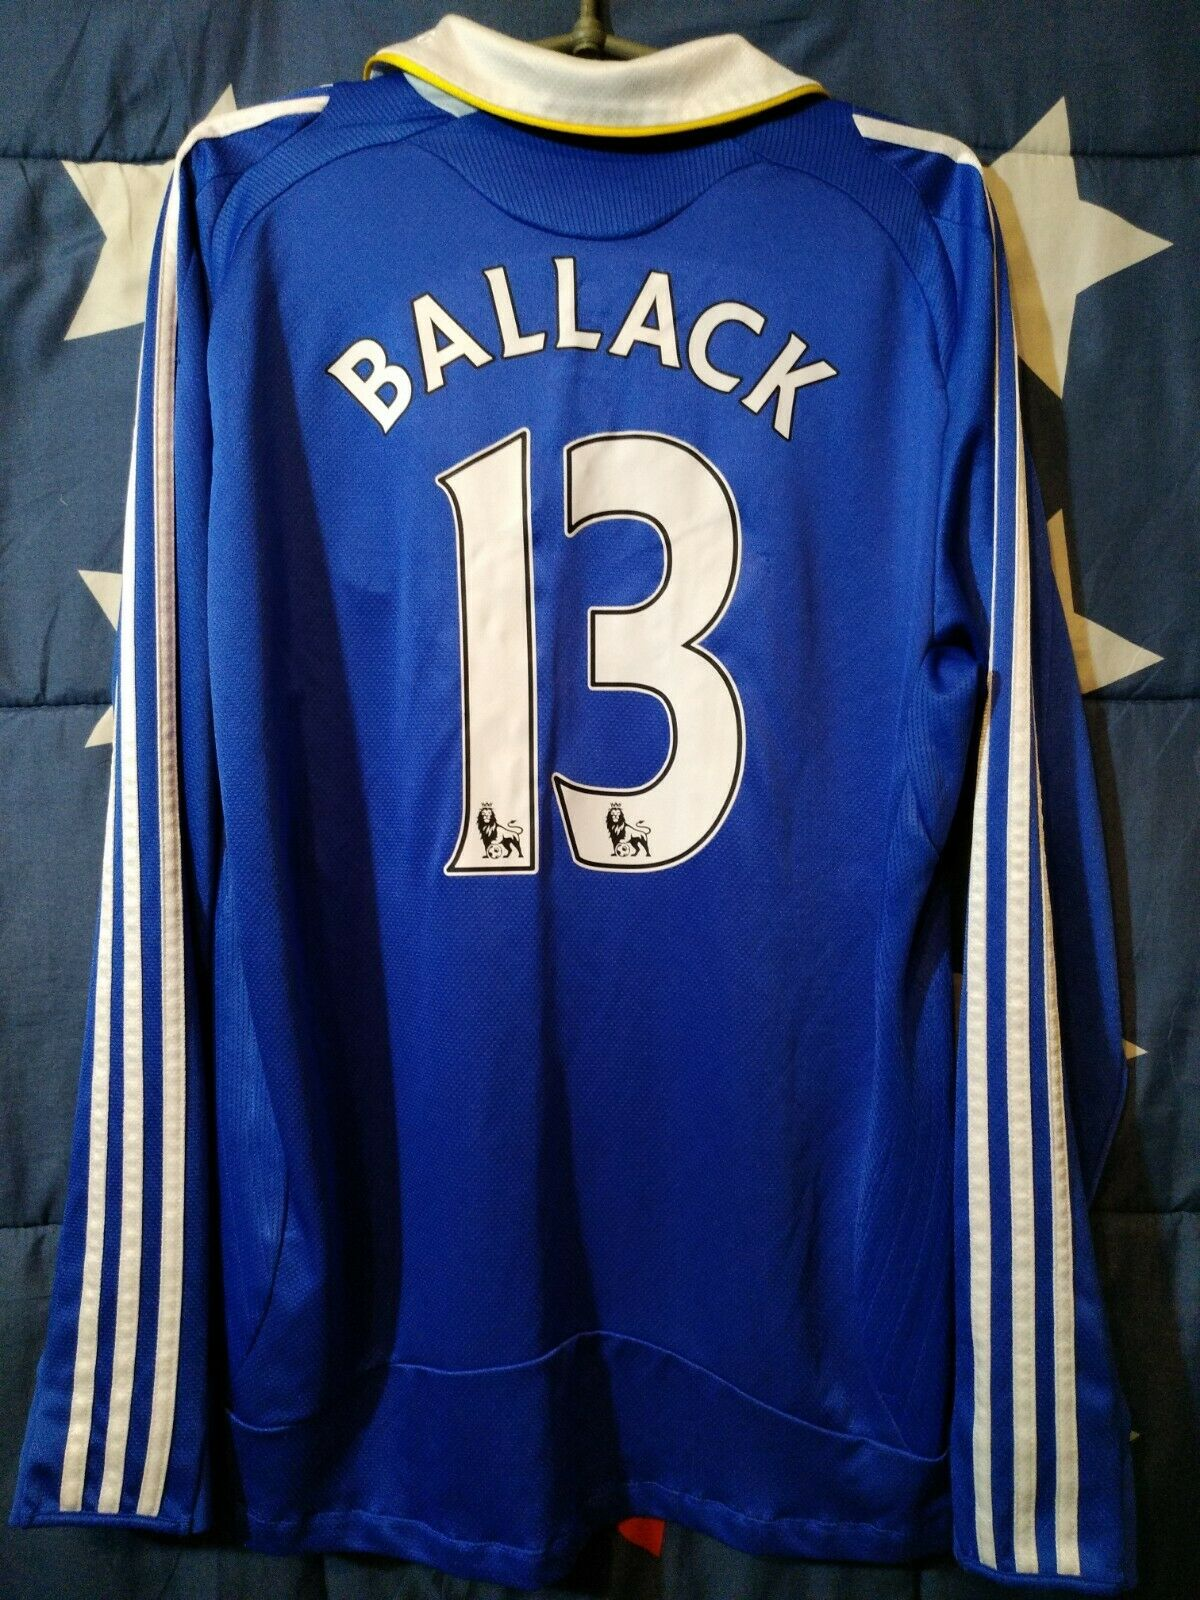 Diuominiione M Chelsea 20082009 Home Footbtutti lungo Sleeve Shirt Jersey Btuttiack  13